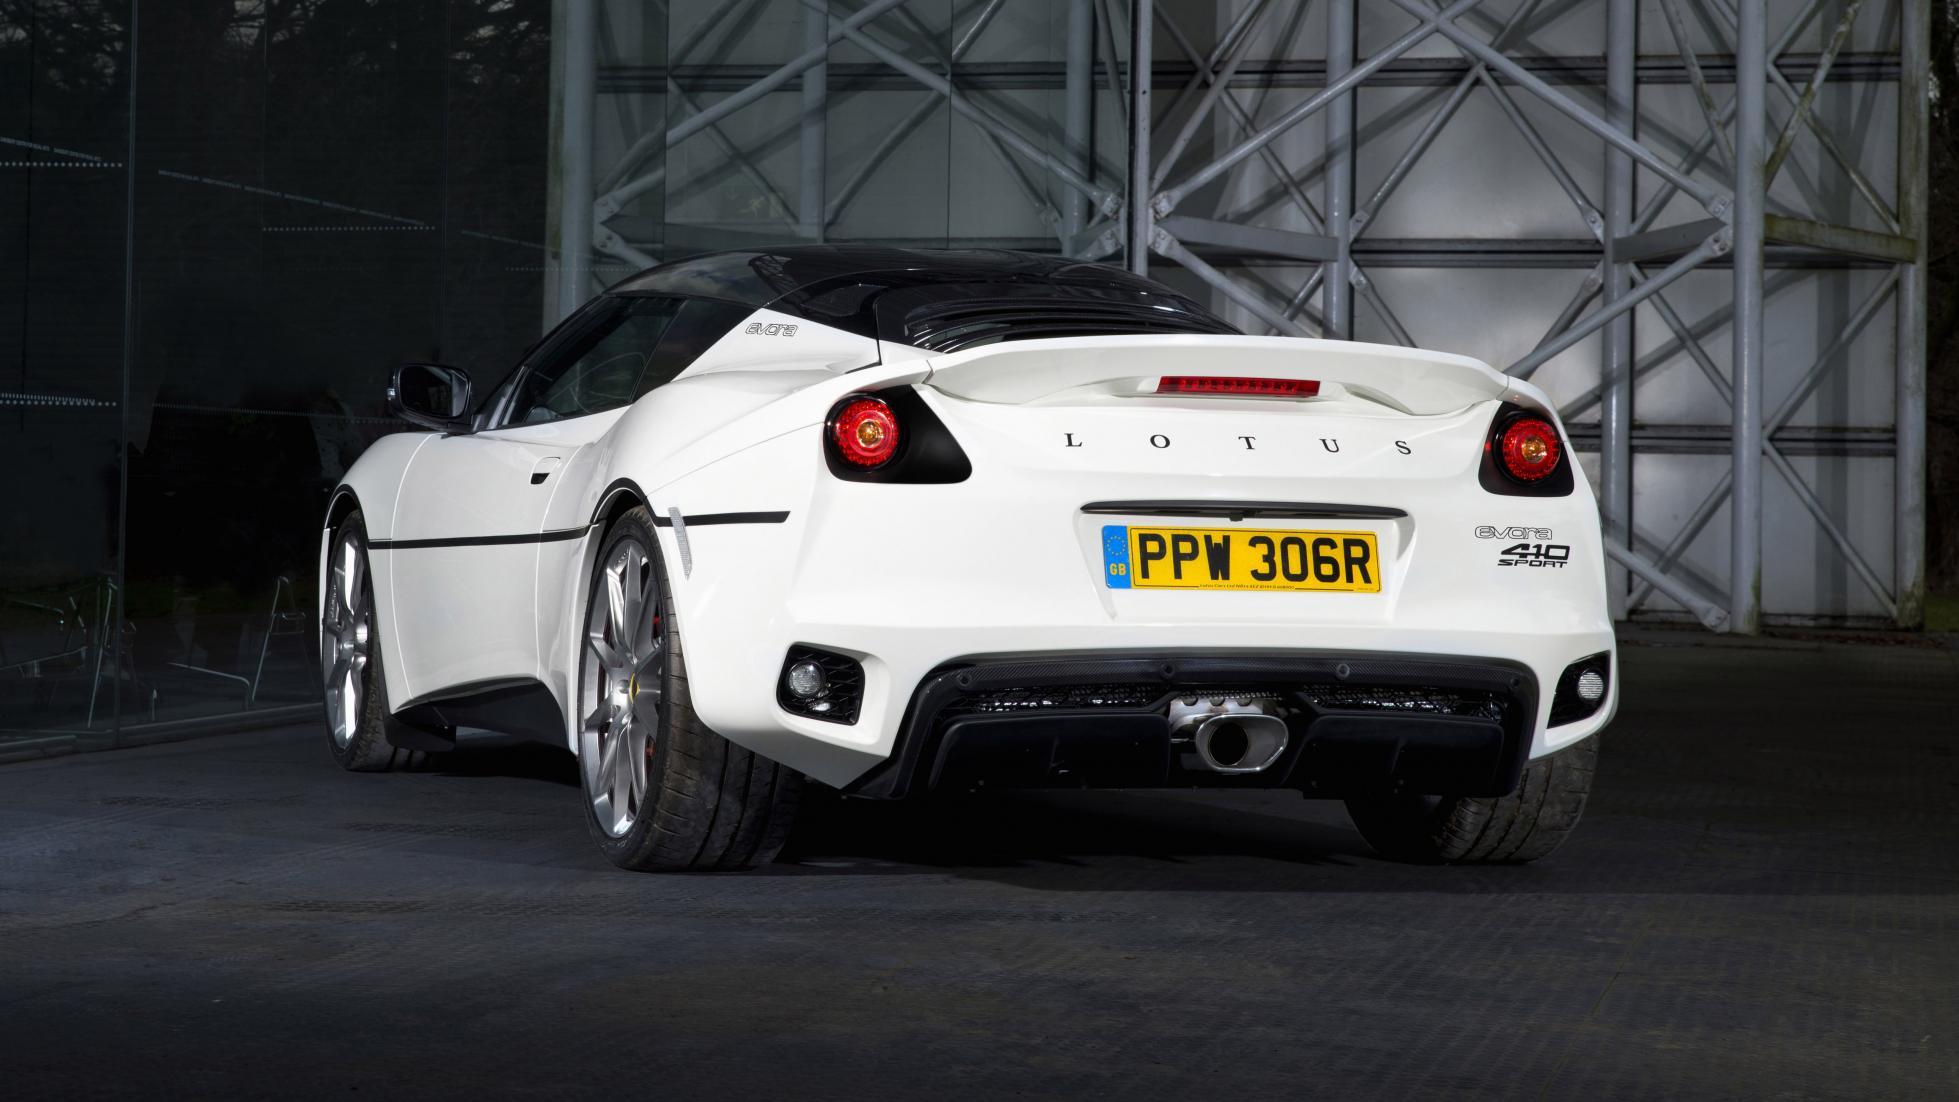 Lotus Evora Sport 410: Un One-Off rindiendo tributo al Esprit S1 de James Bond